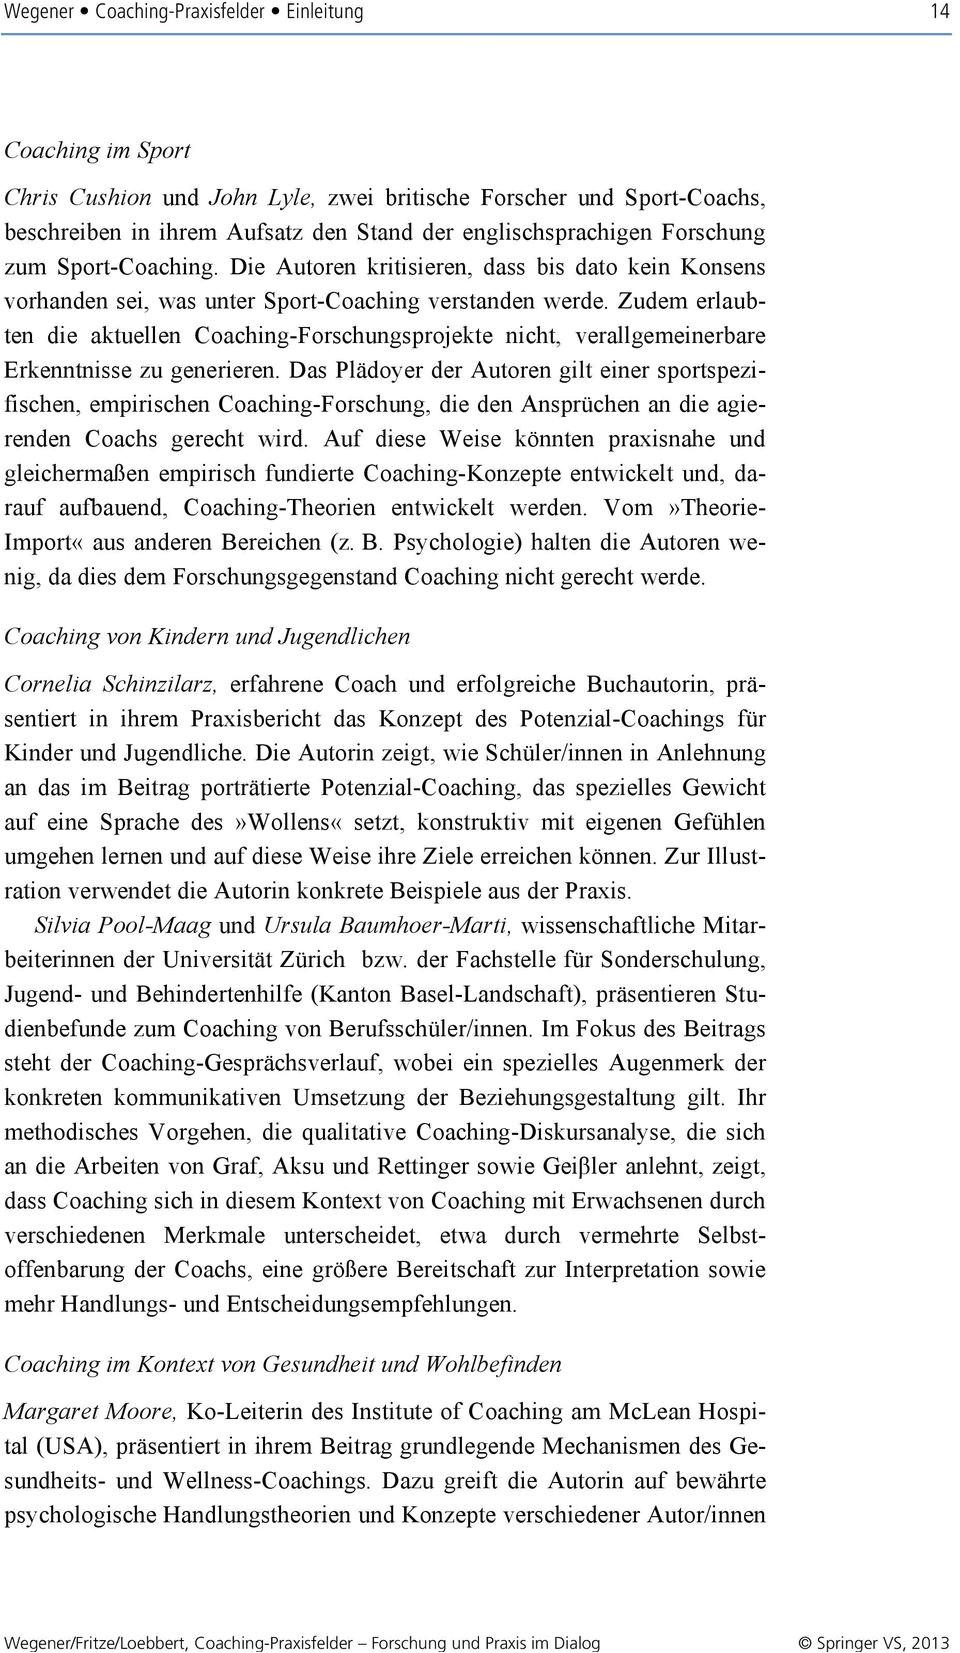 page 14 jpg